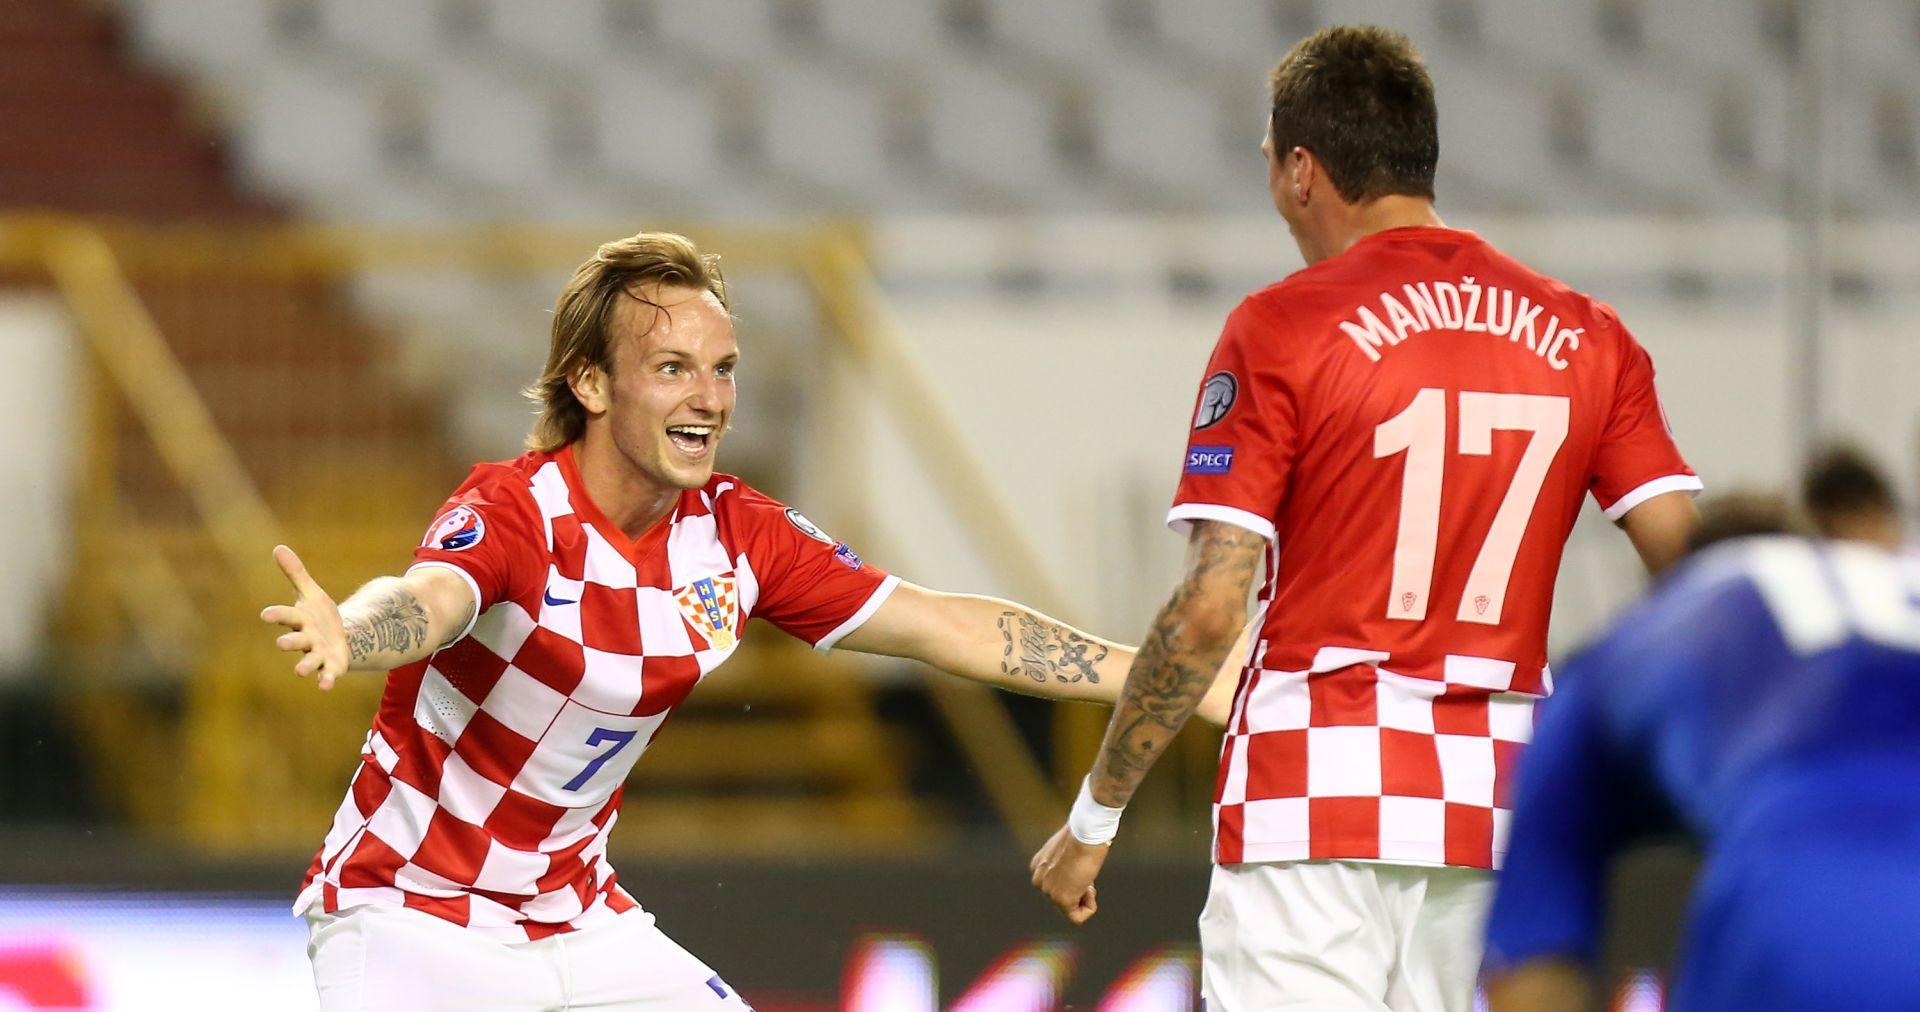 SUN Mandžukić, Pjaca i Alves već mjesecima preko WhatsAppa 'mame' Rakitića u Juventus